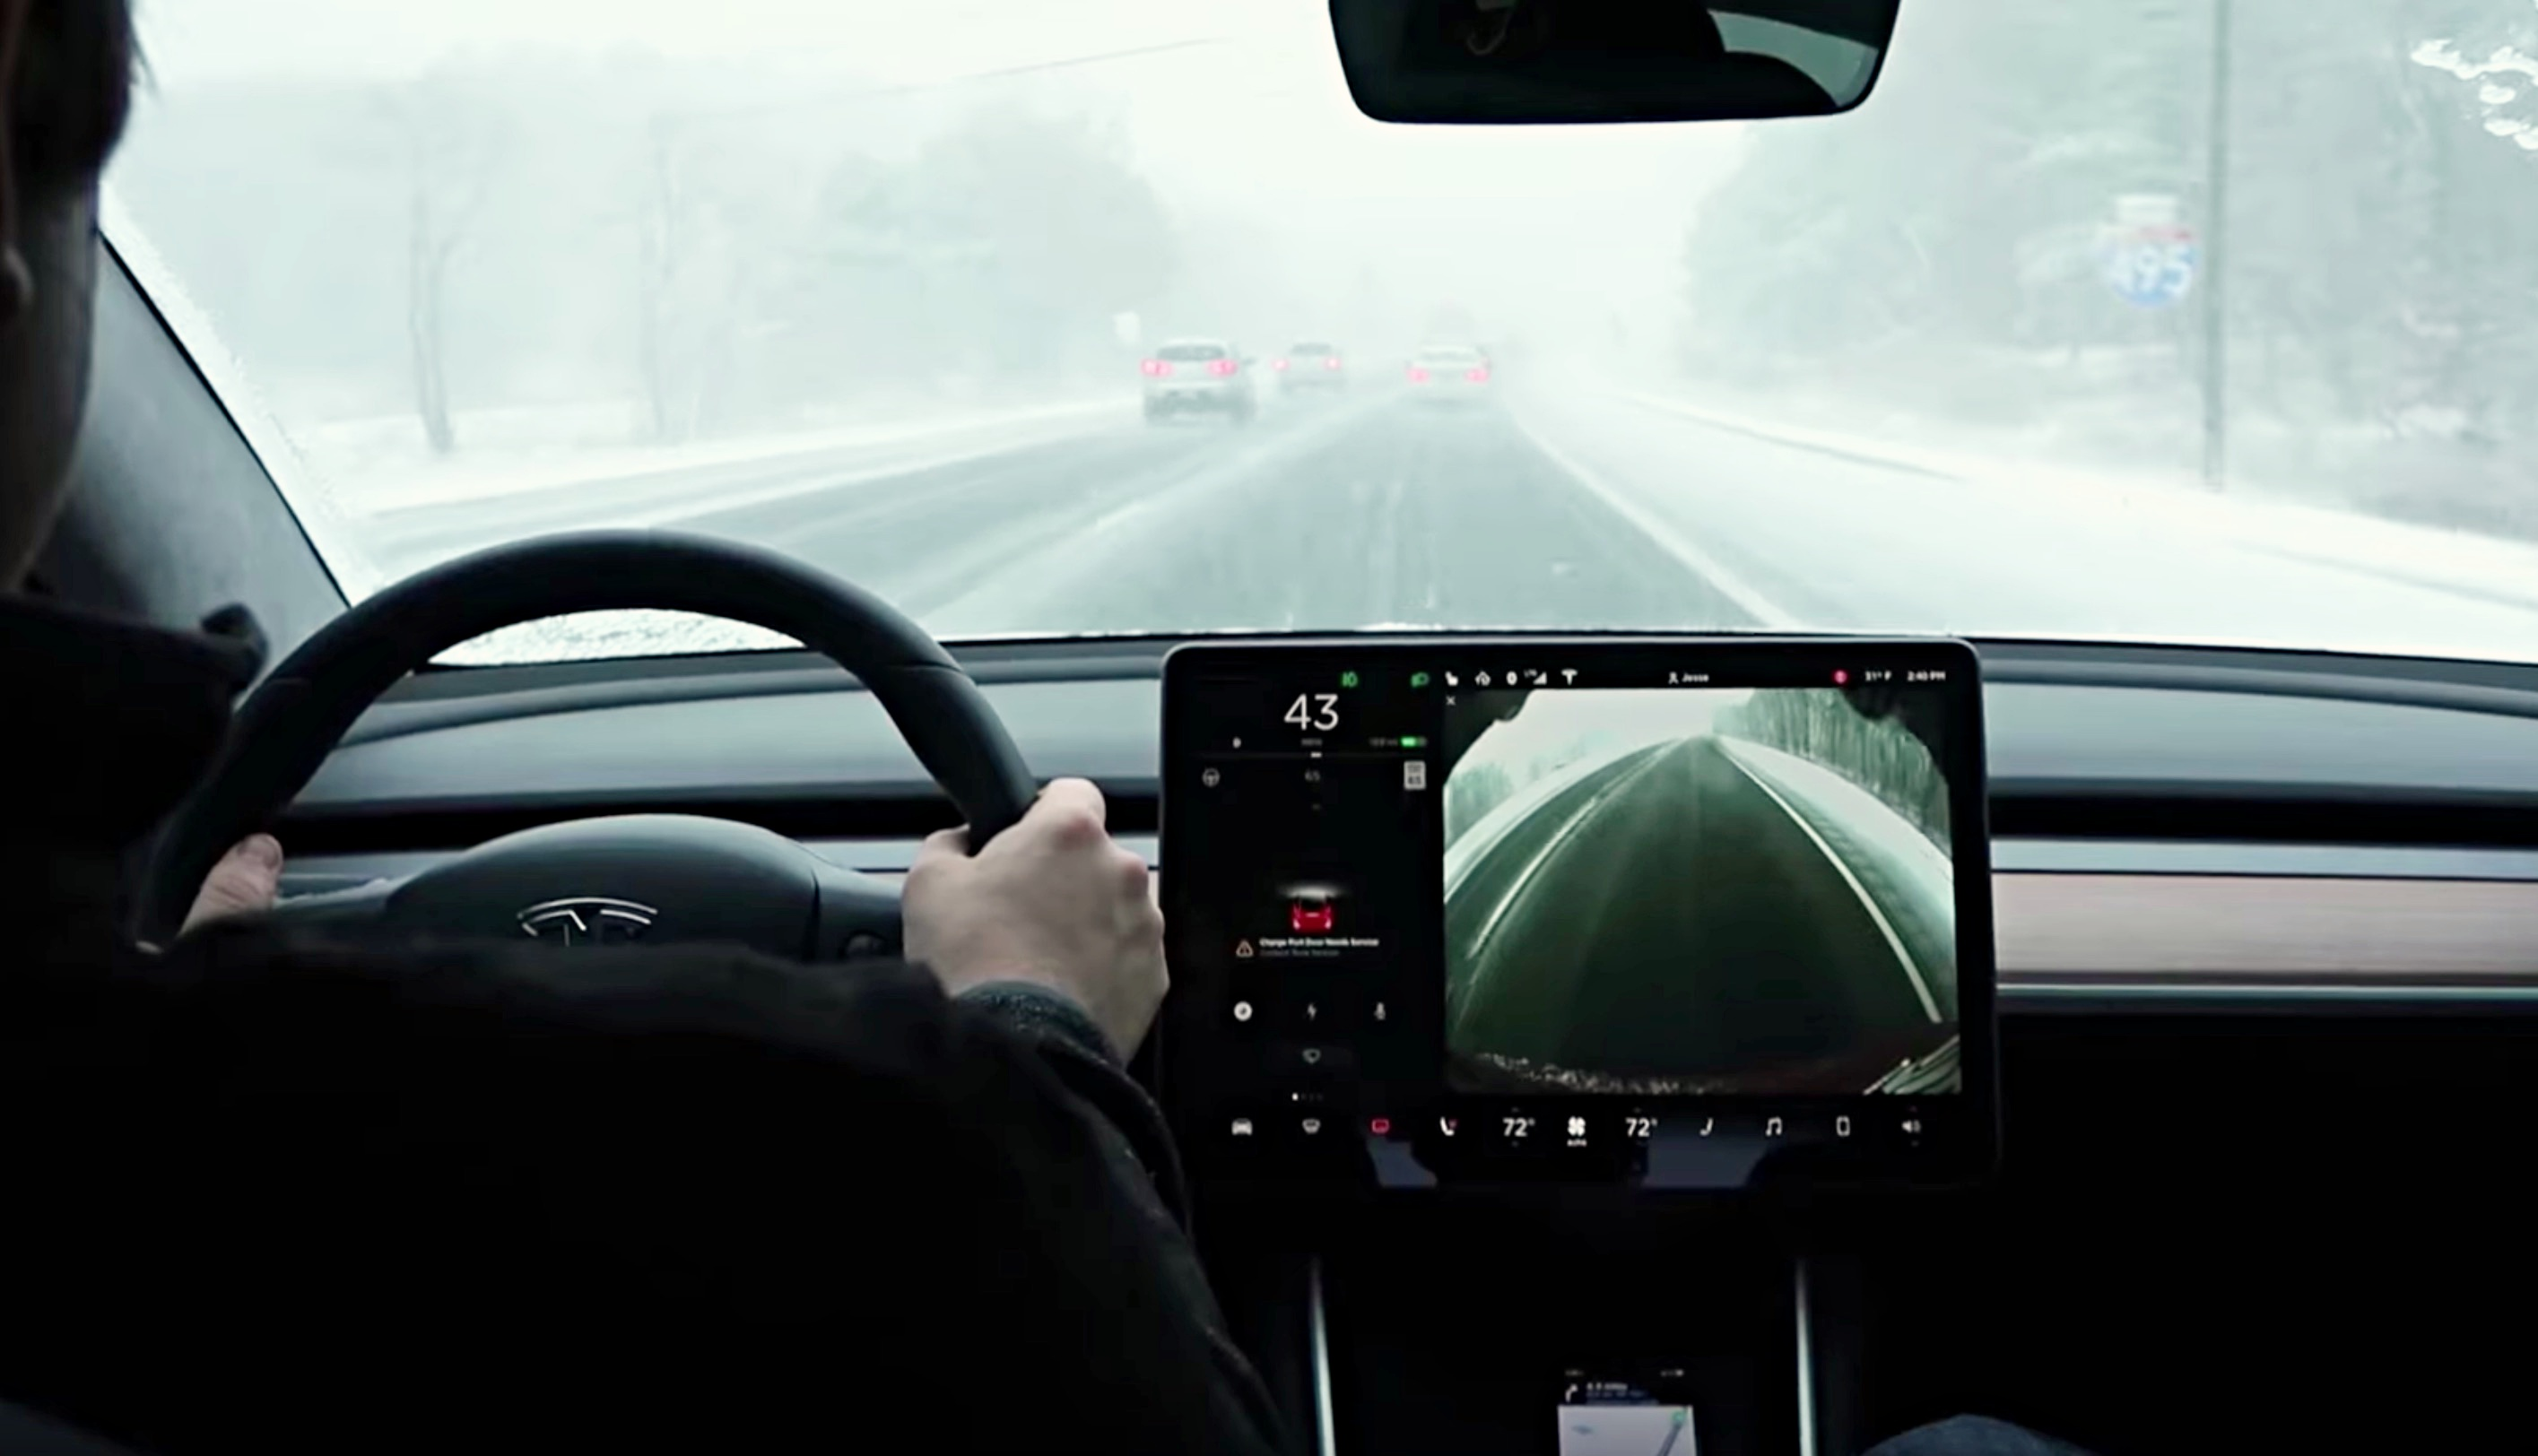 tesla-model-3-touchscreen-snow-winter